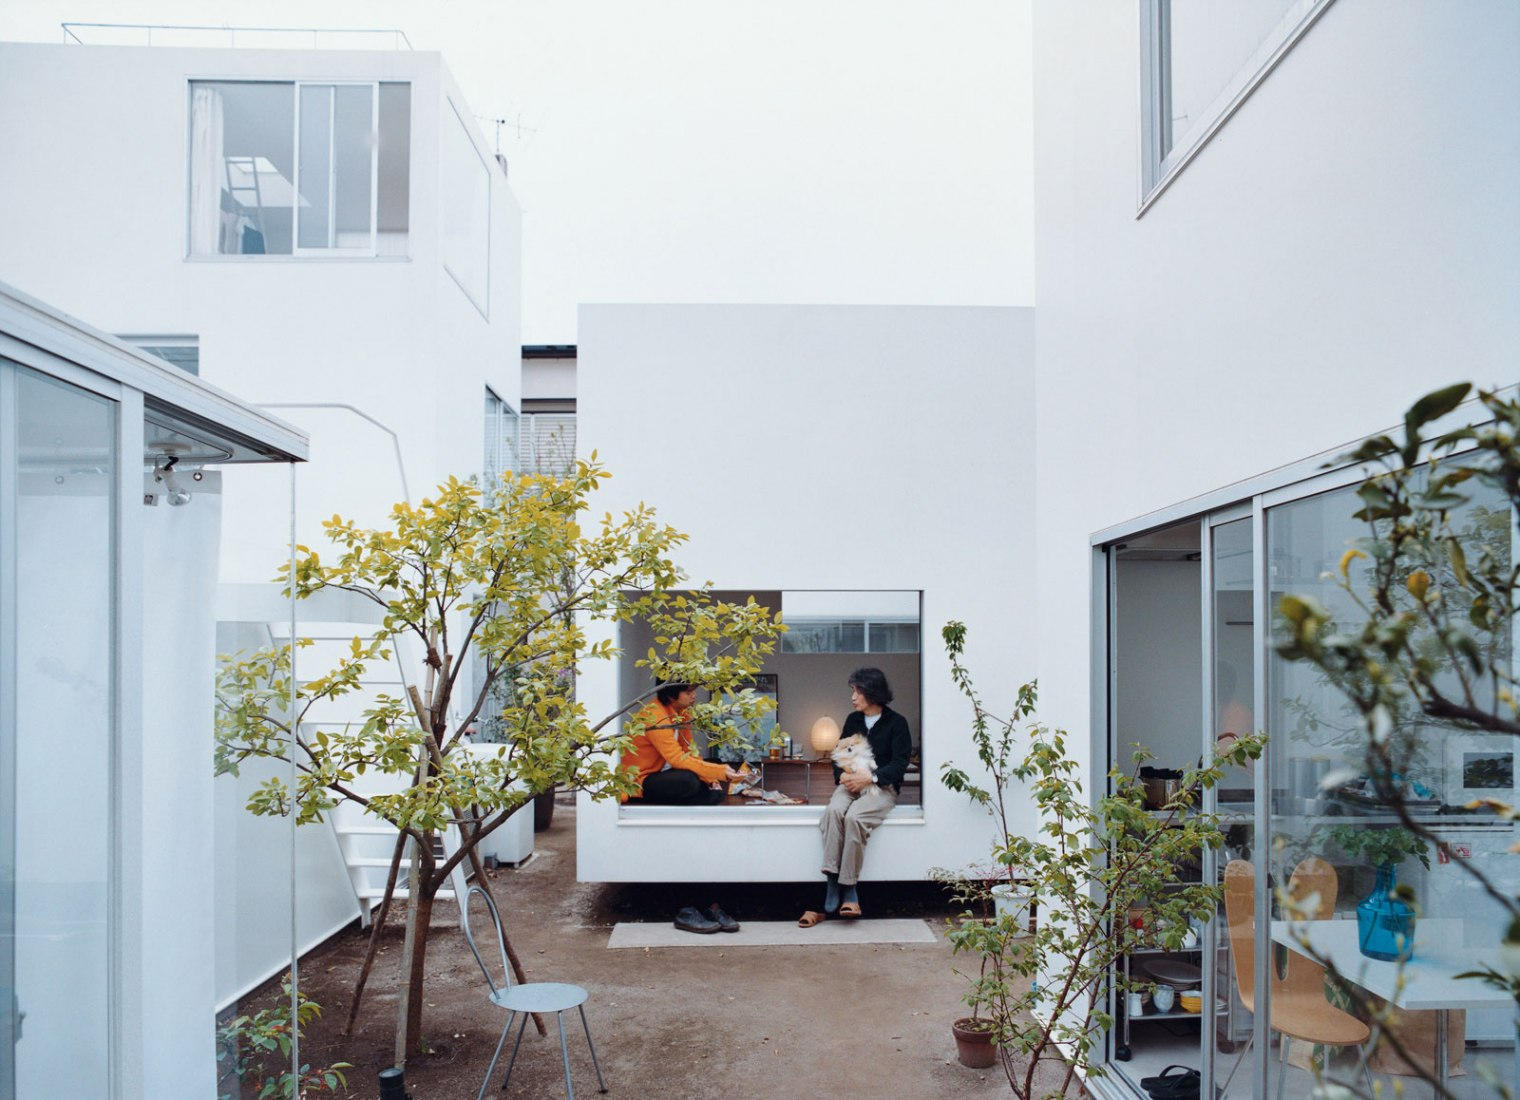 Ryue Nishizawa, Casa Moriyama, Tokio, Japón, 2005.